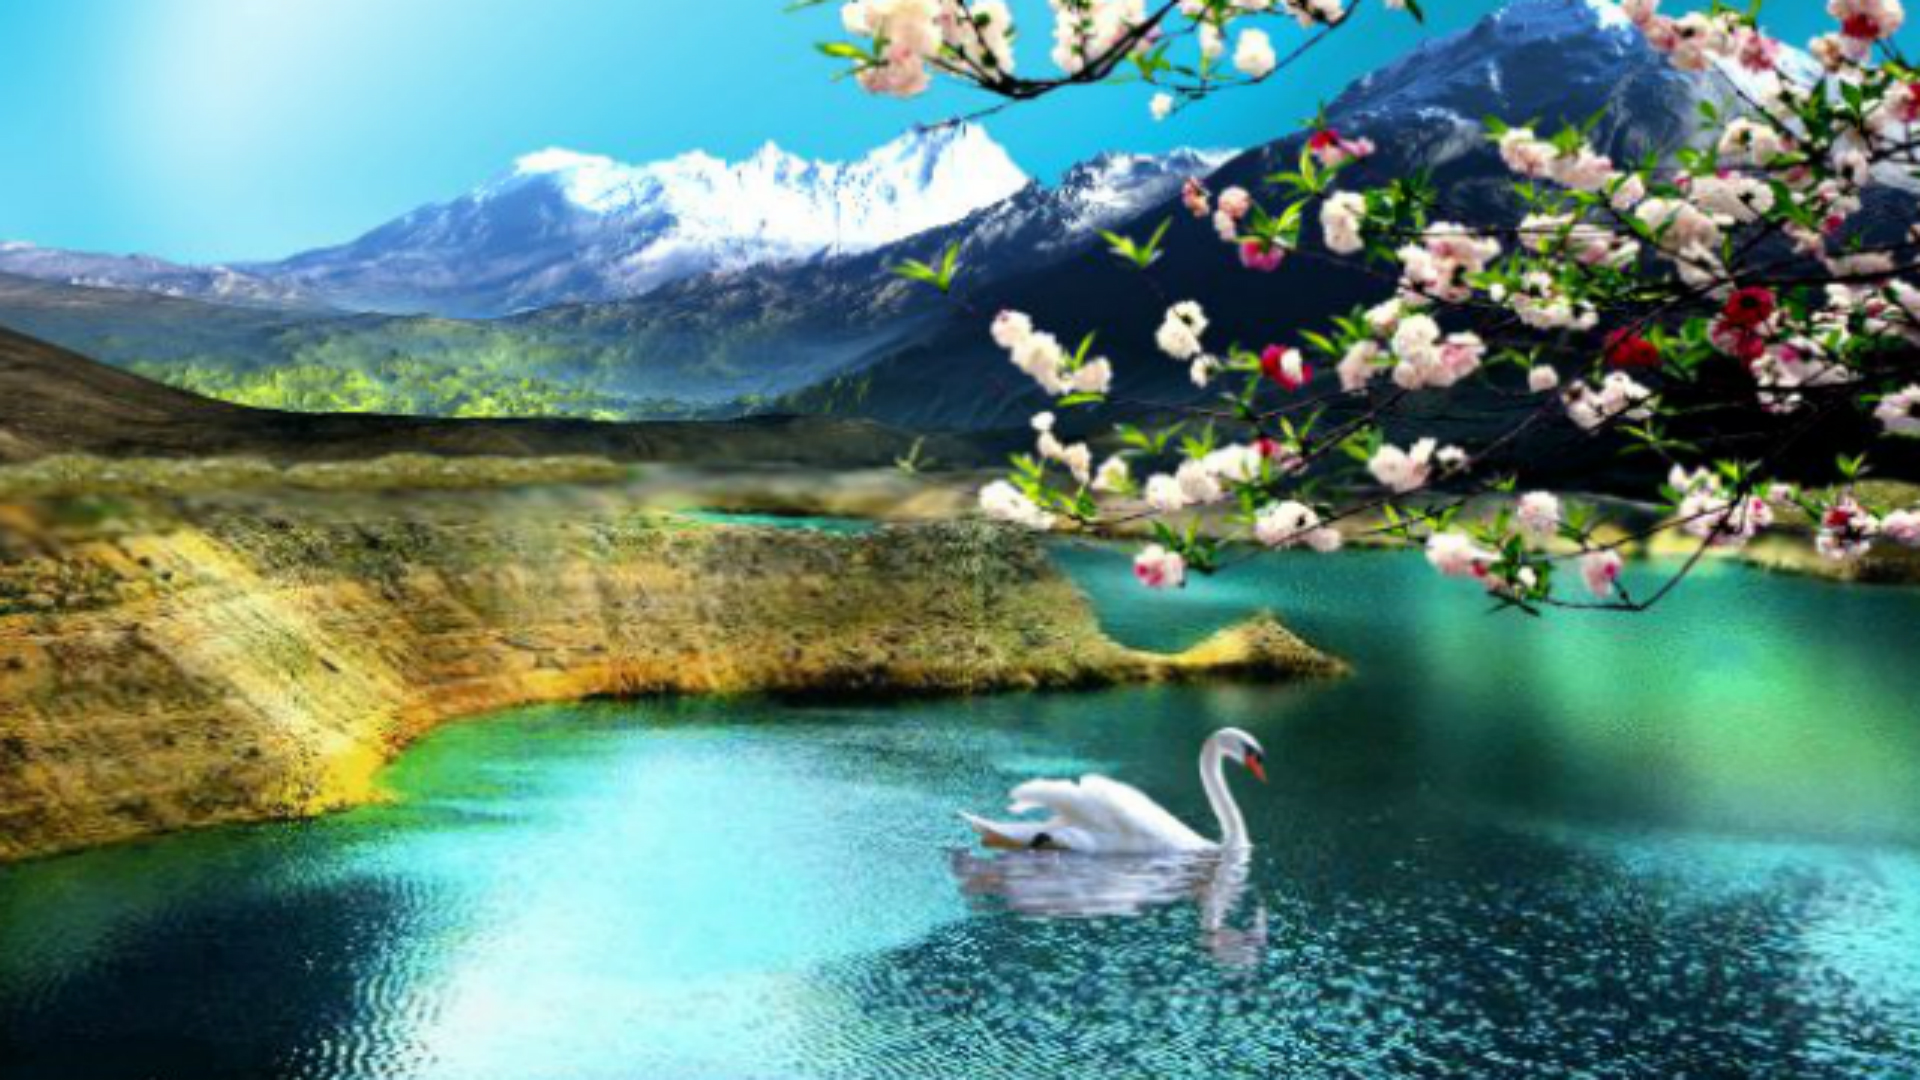 3 34843 wallpaper hd 1080p free download for windows windows